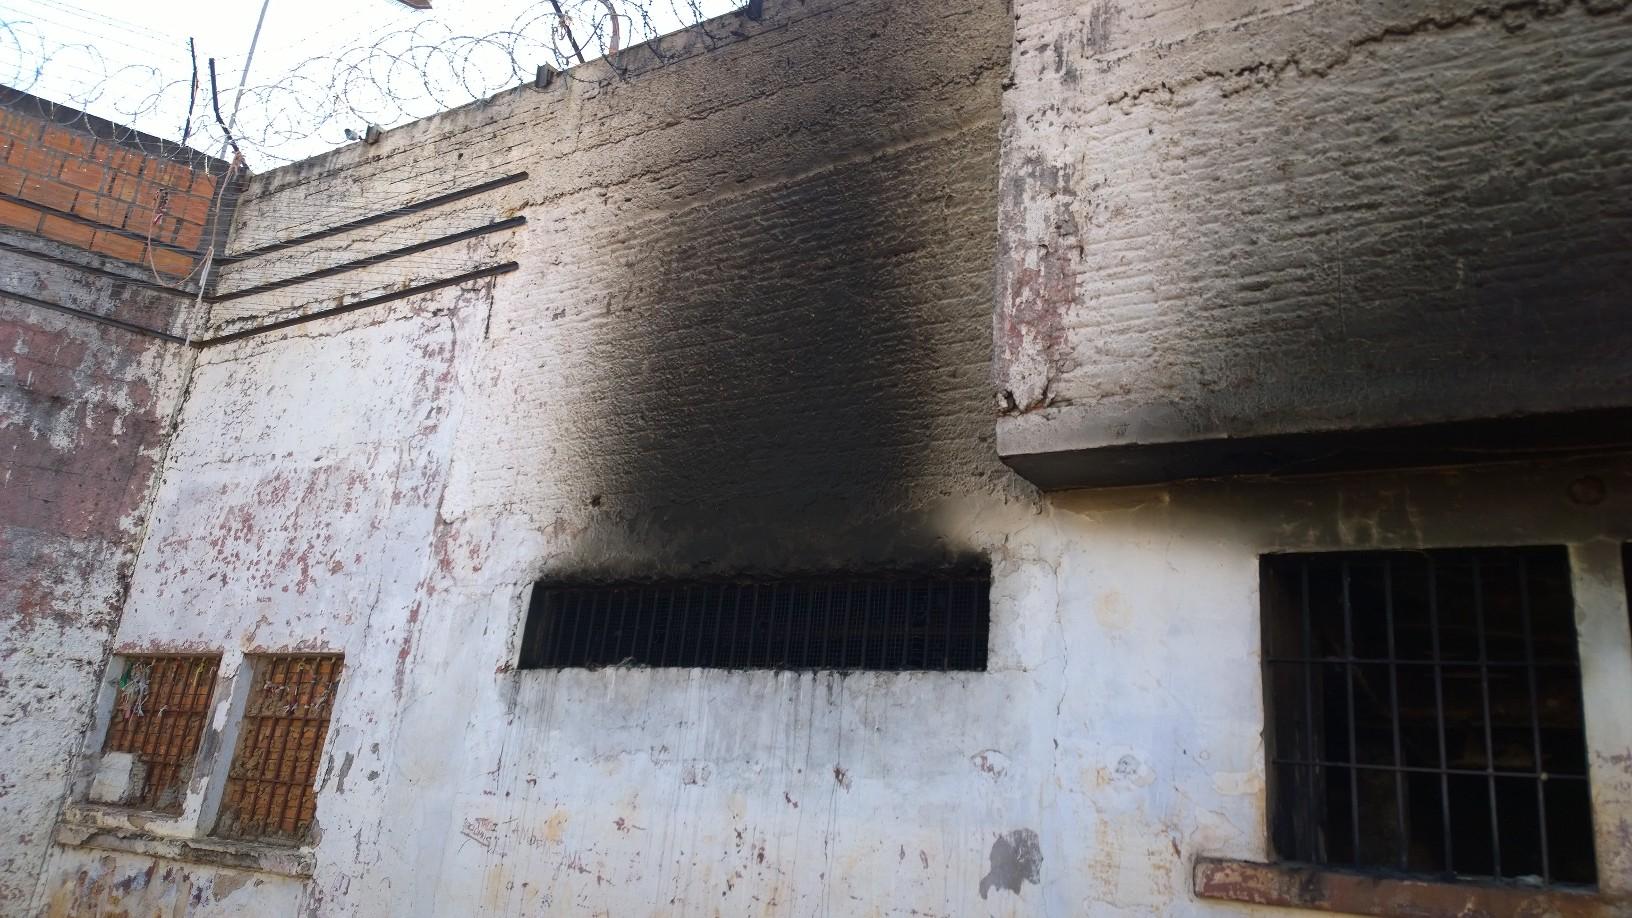 Defesa Civil de Erechim faz vistoria no presidio de Erechim após incêndio na ala do semi aberto